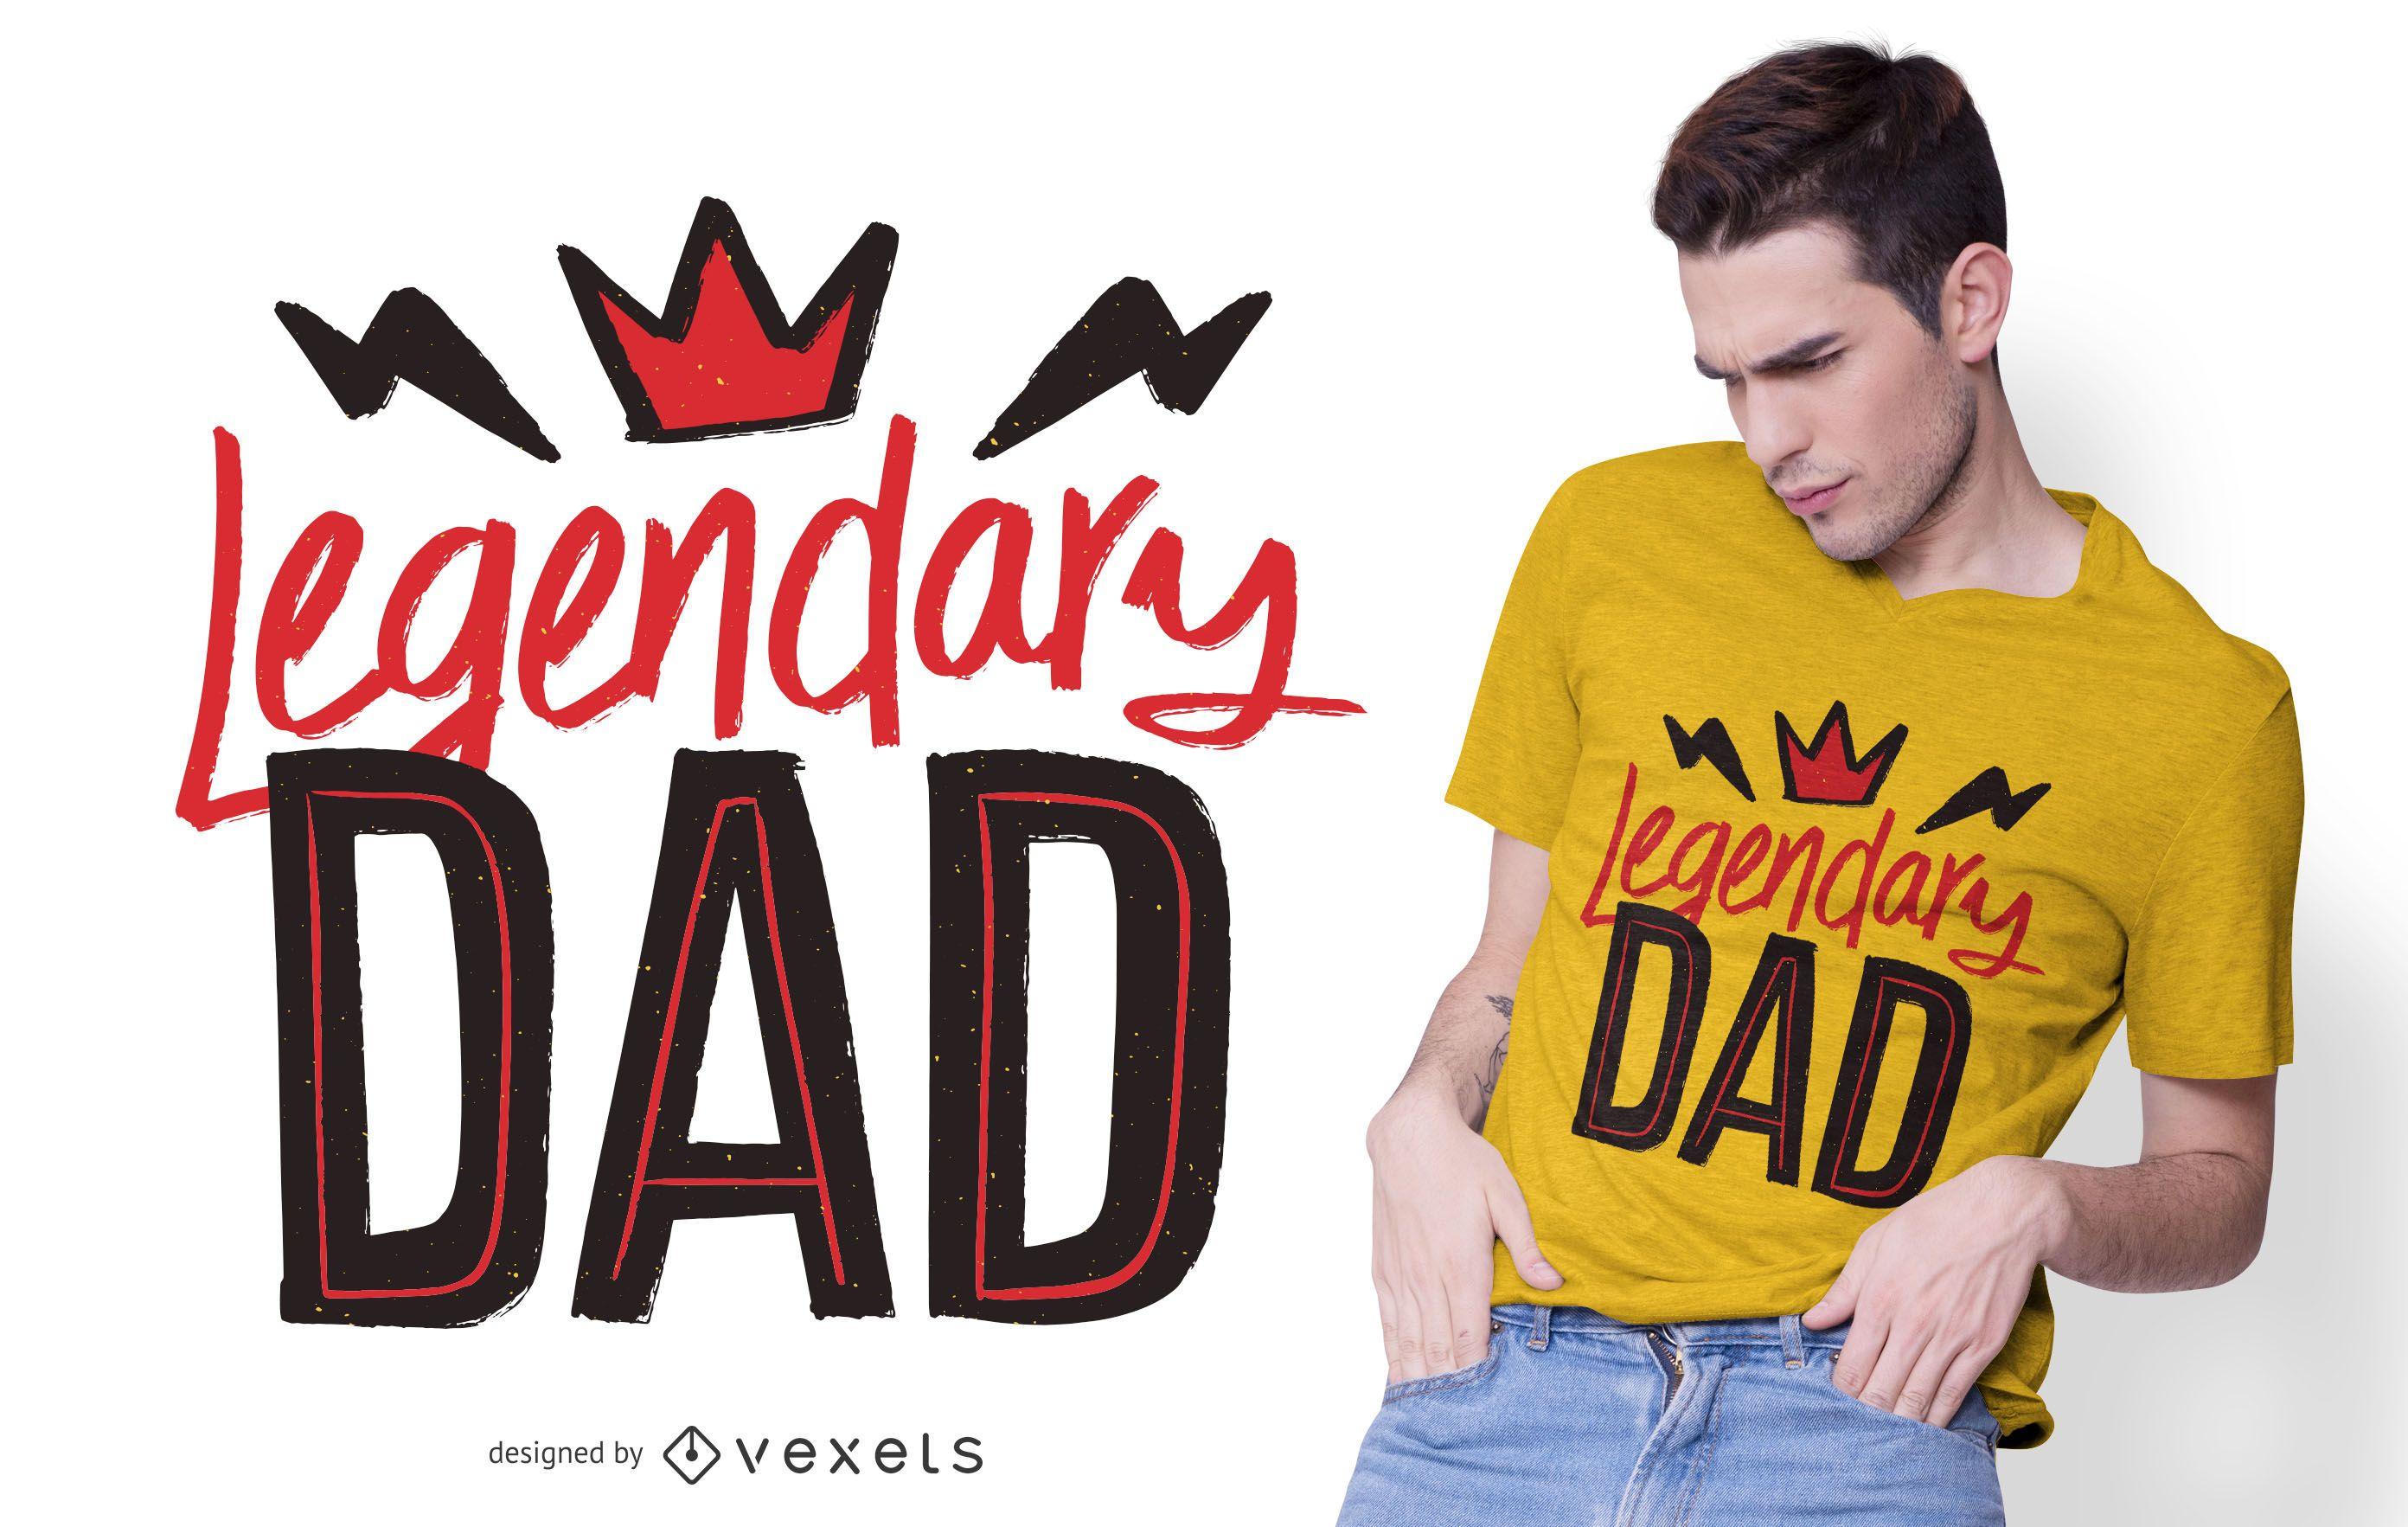 Legendary Dad T-shirt Design